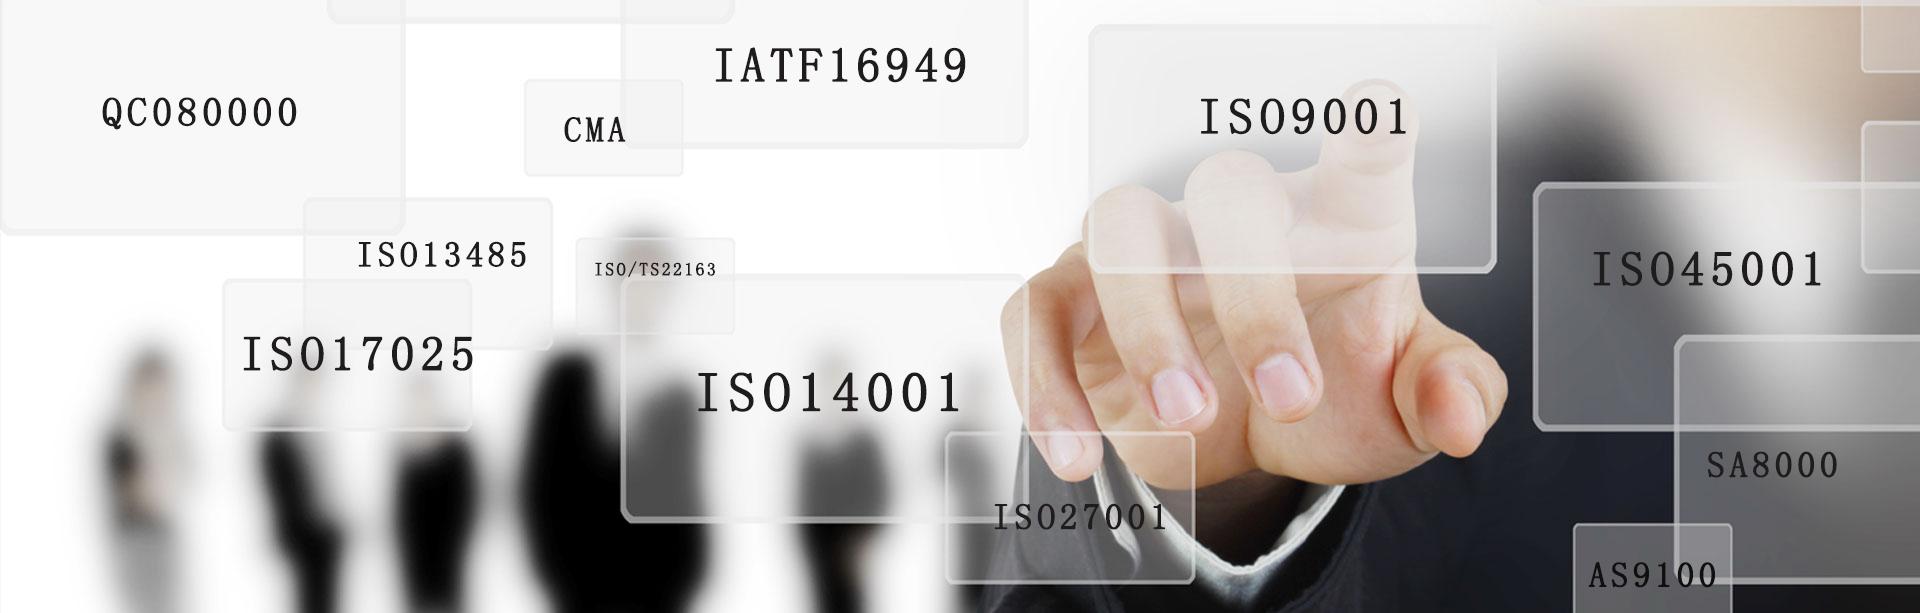 IATF16949证明